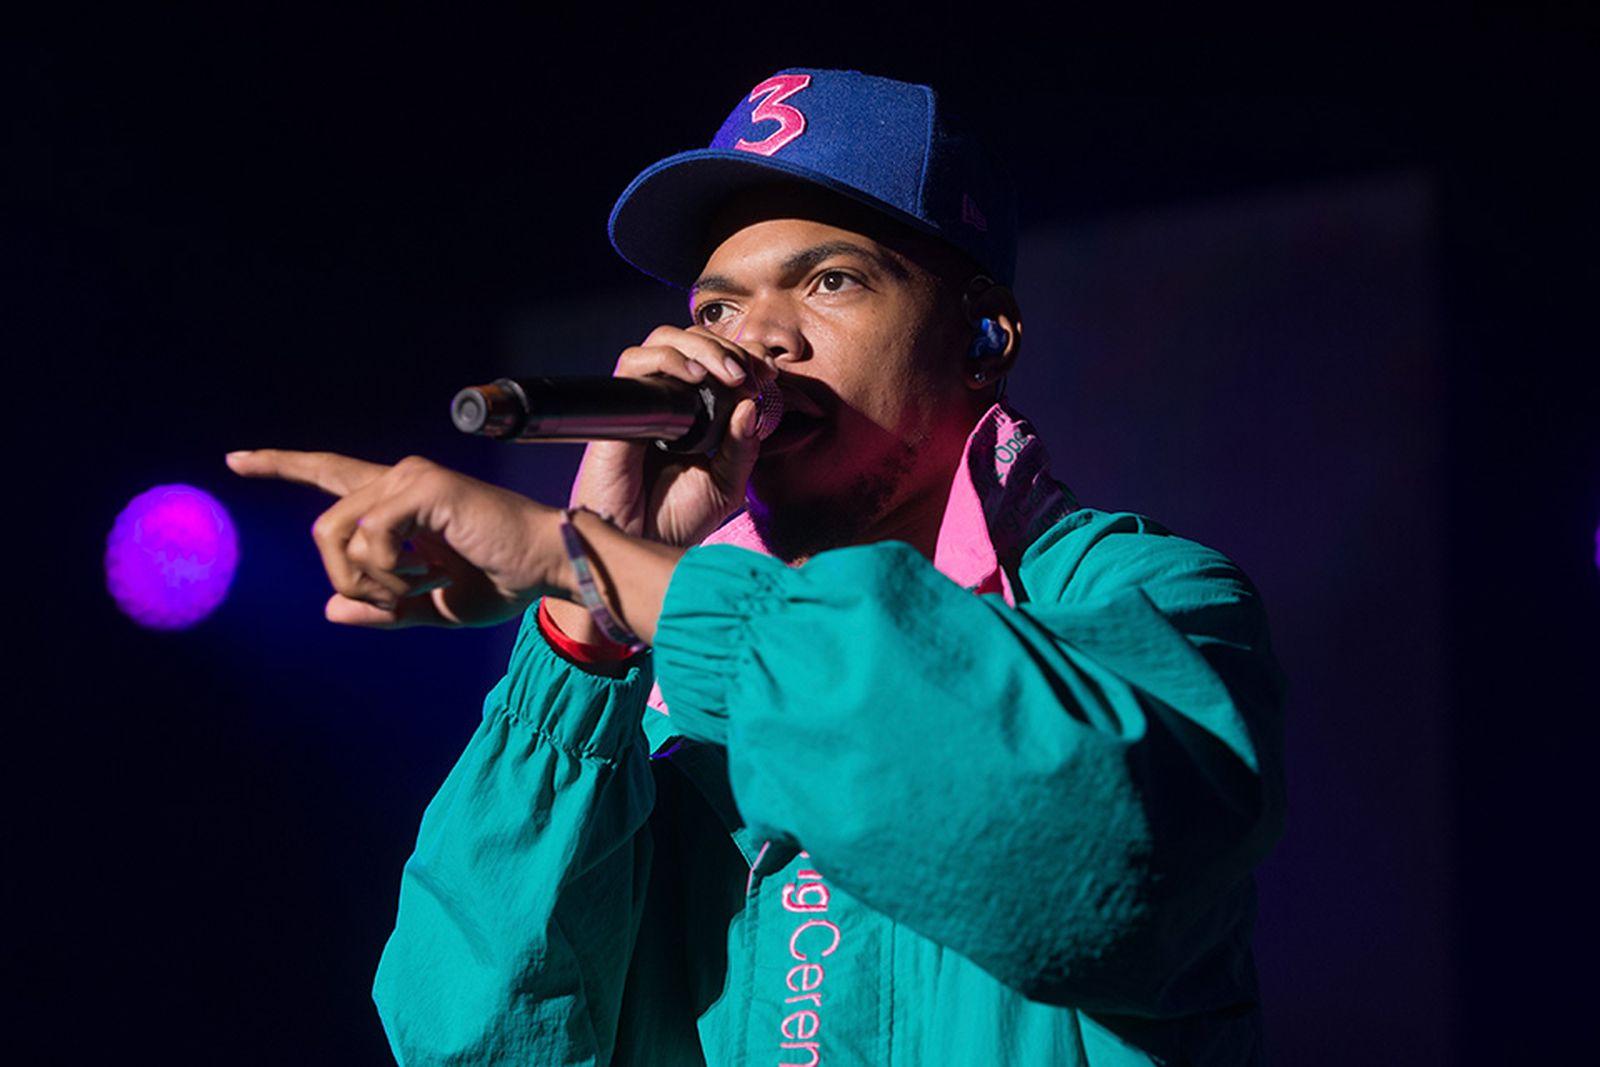 chance the rapper r kelly R. Kelly